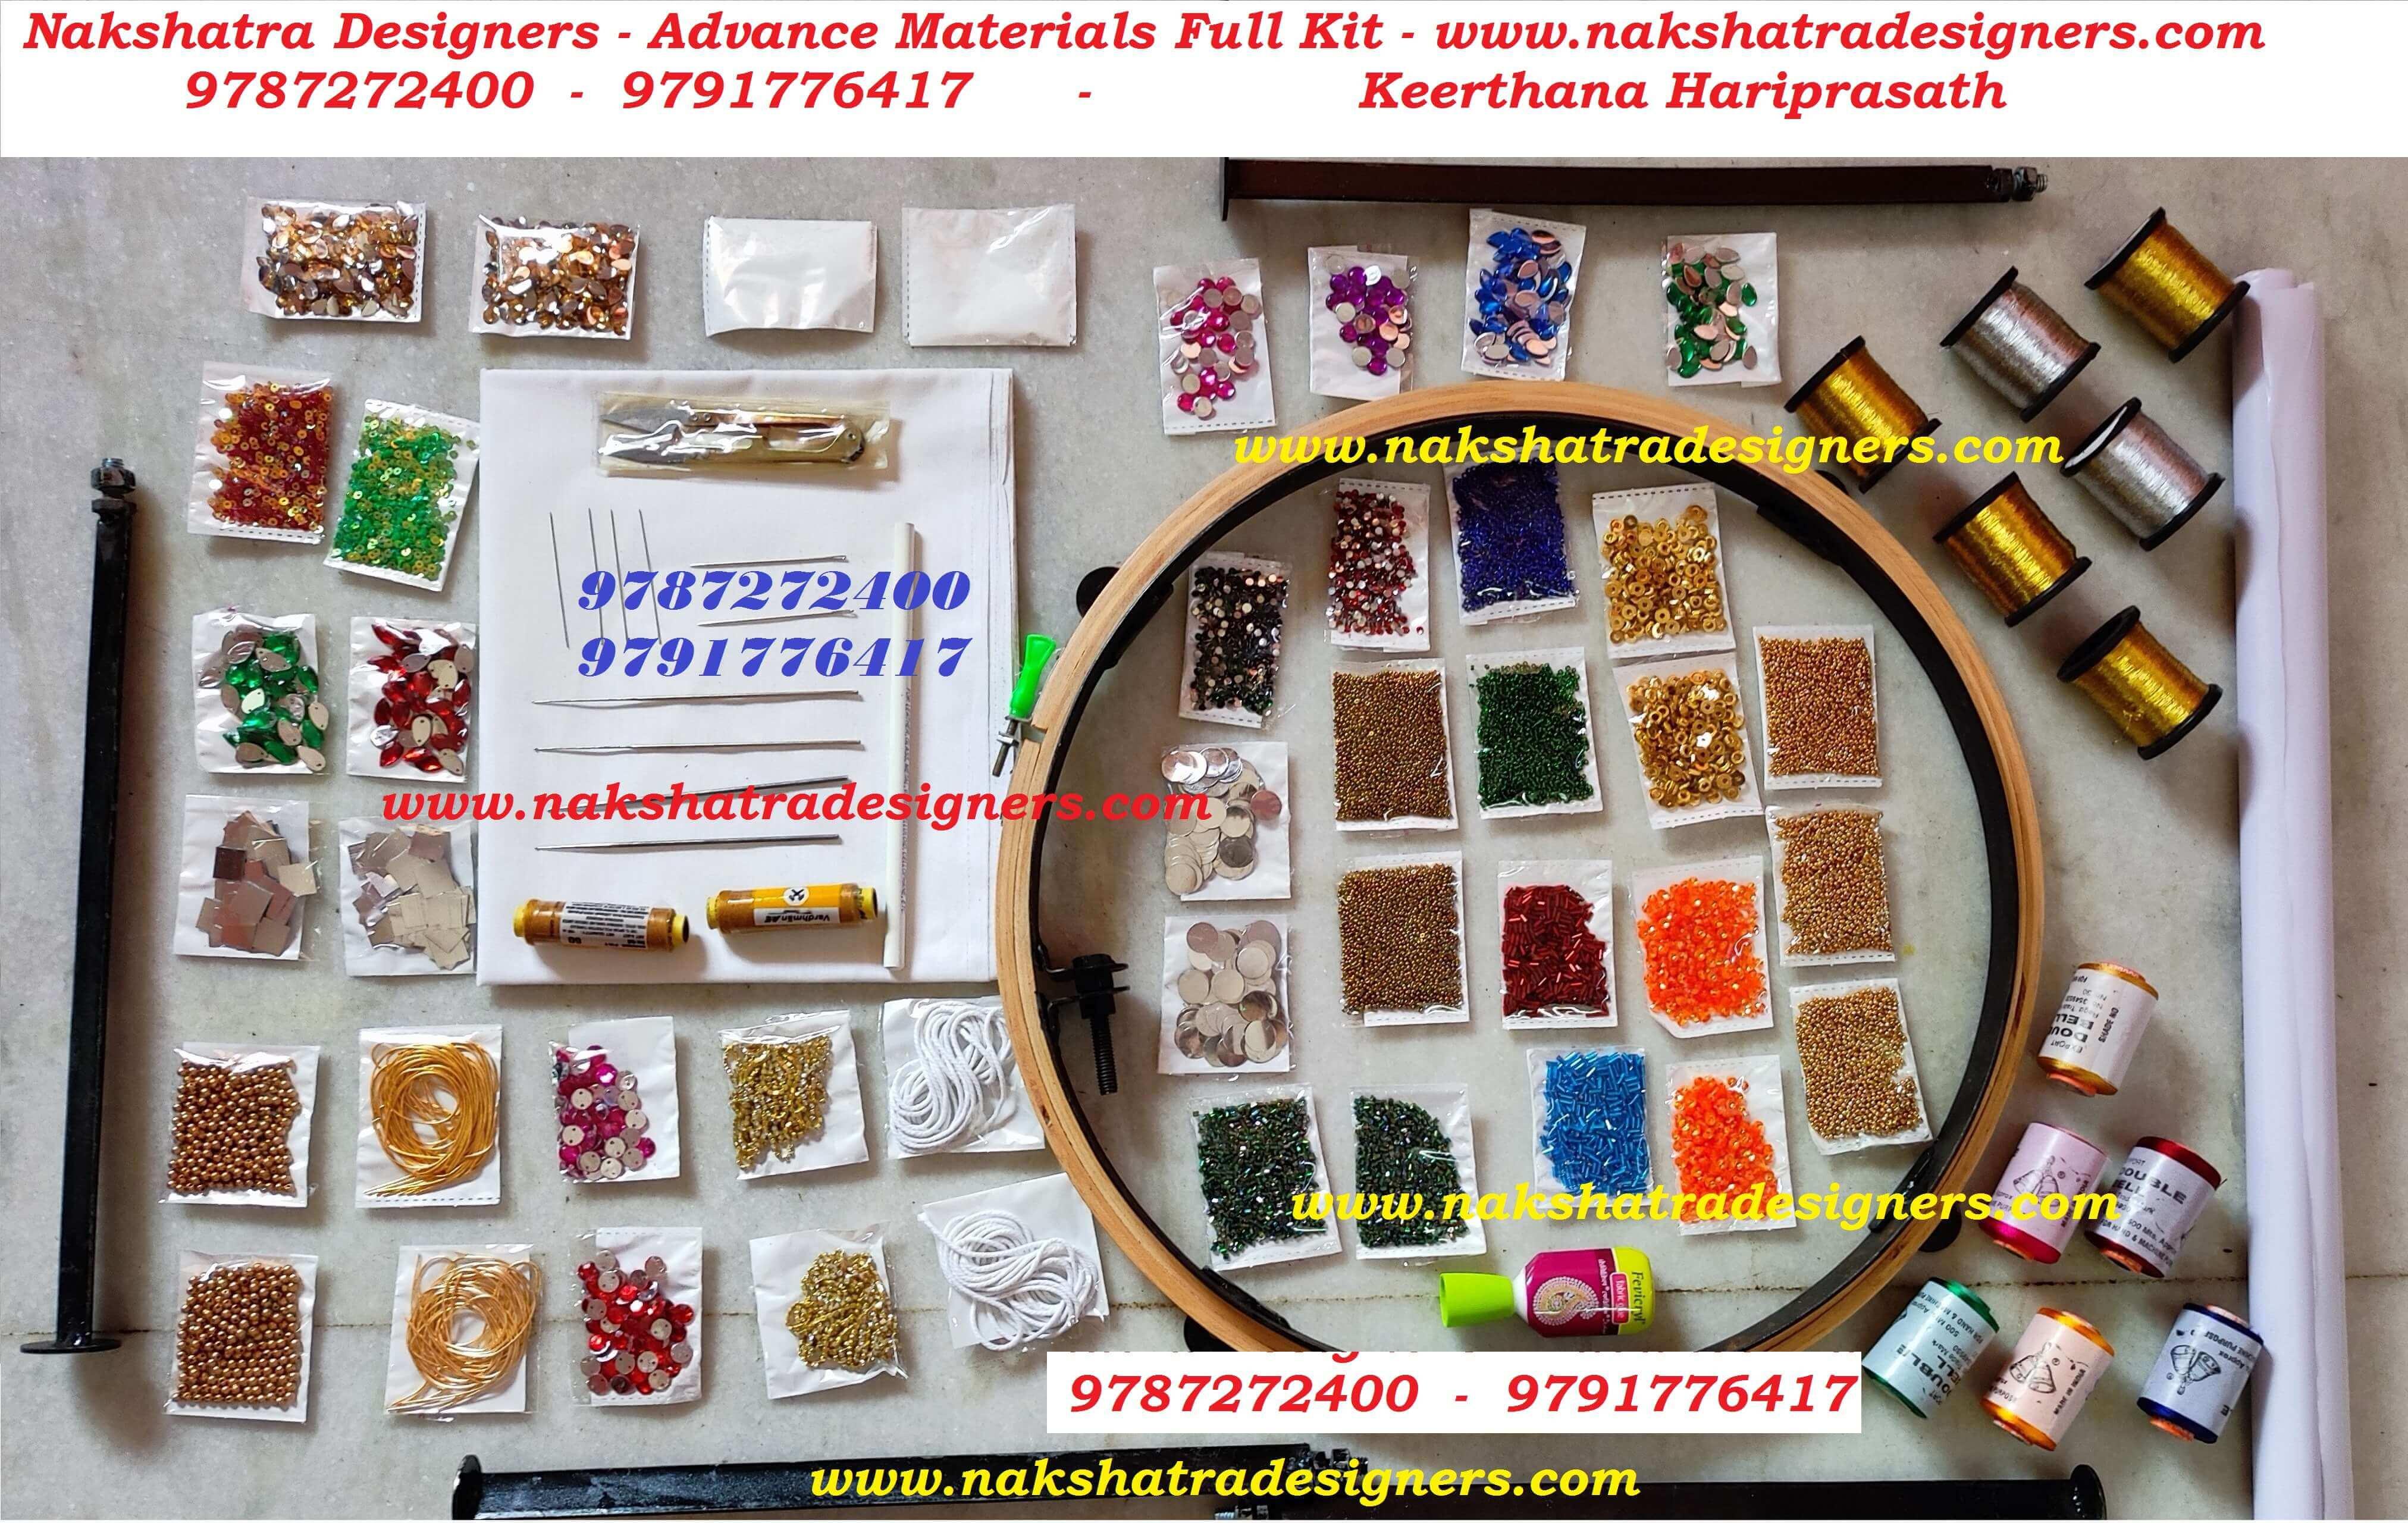 Aari Embroidery Materials 91 9791776417 91 9787272400